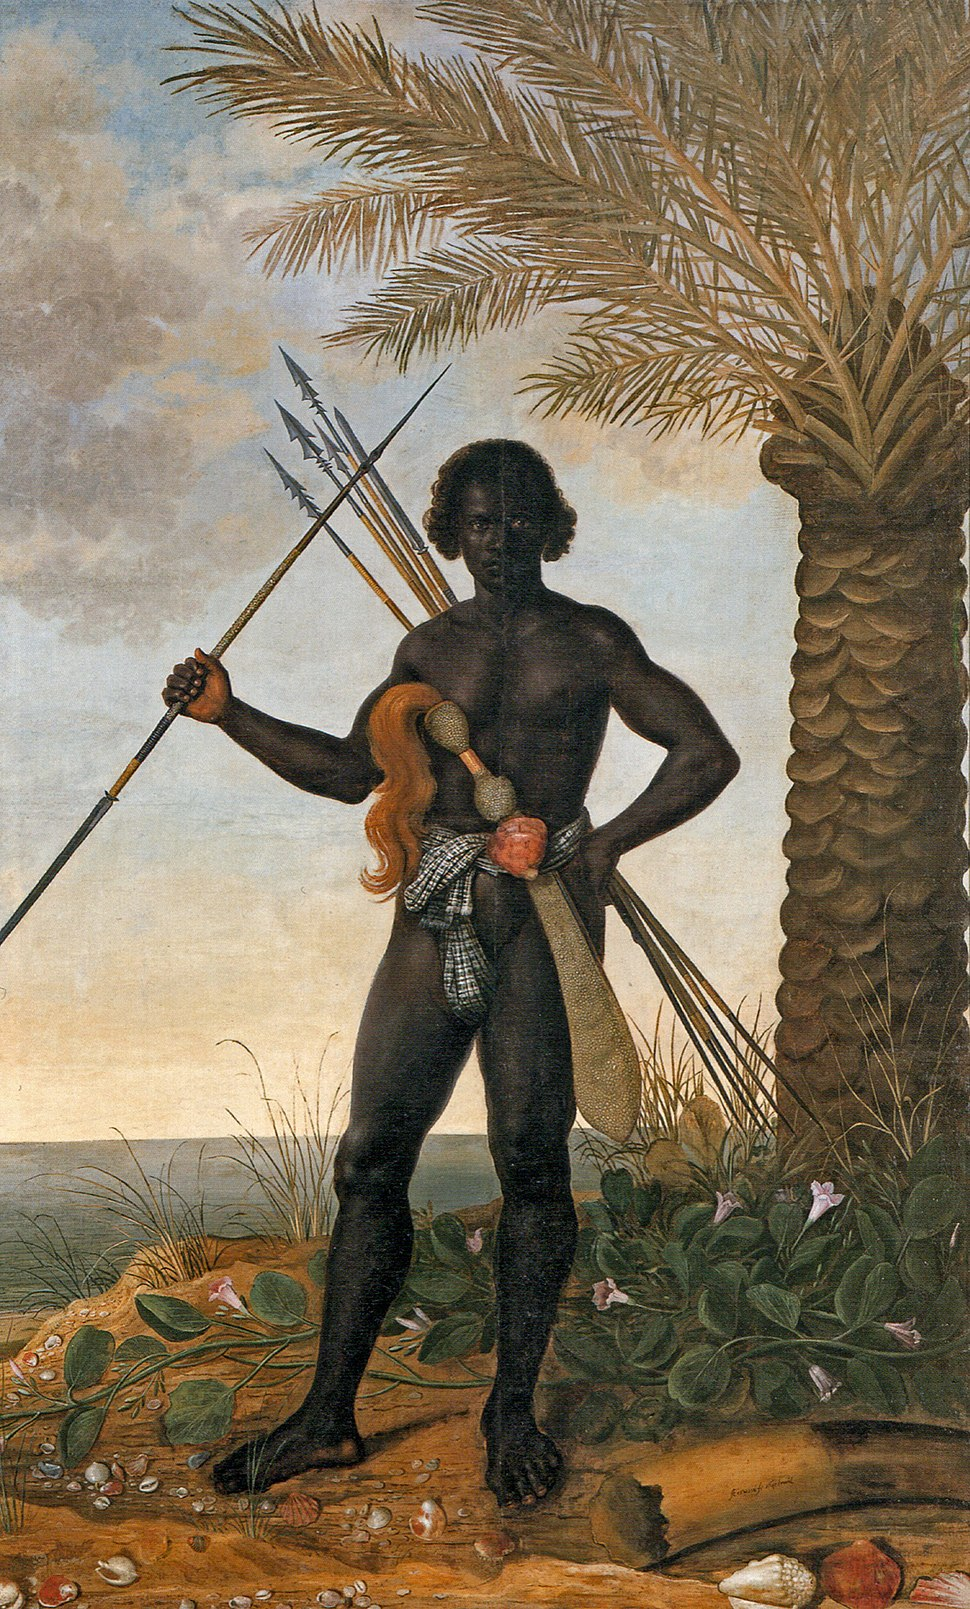 Albert Eckhout painting